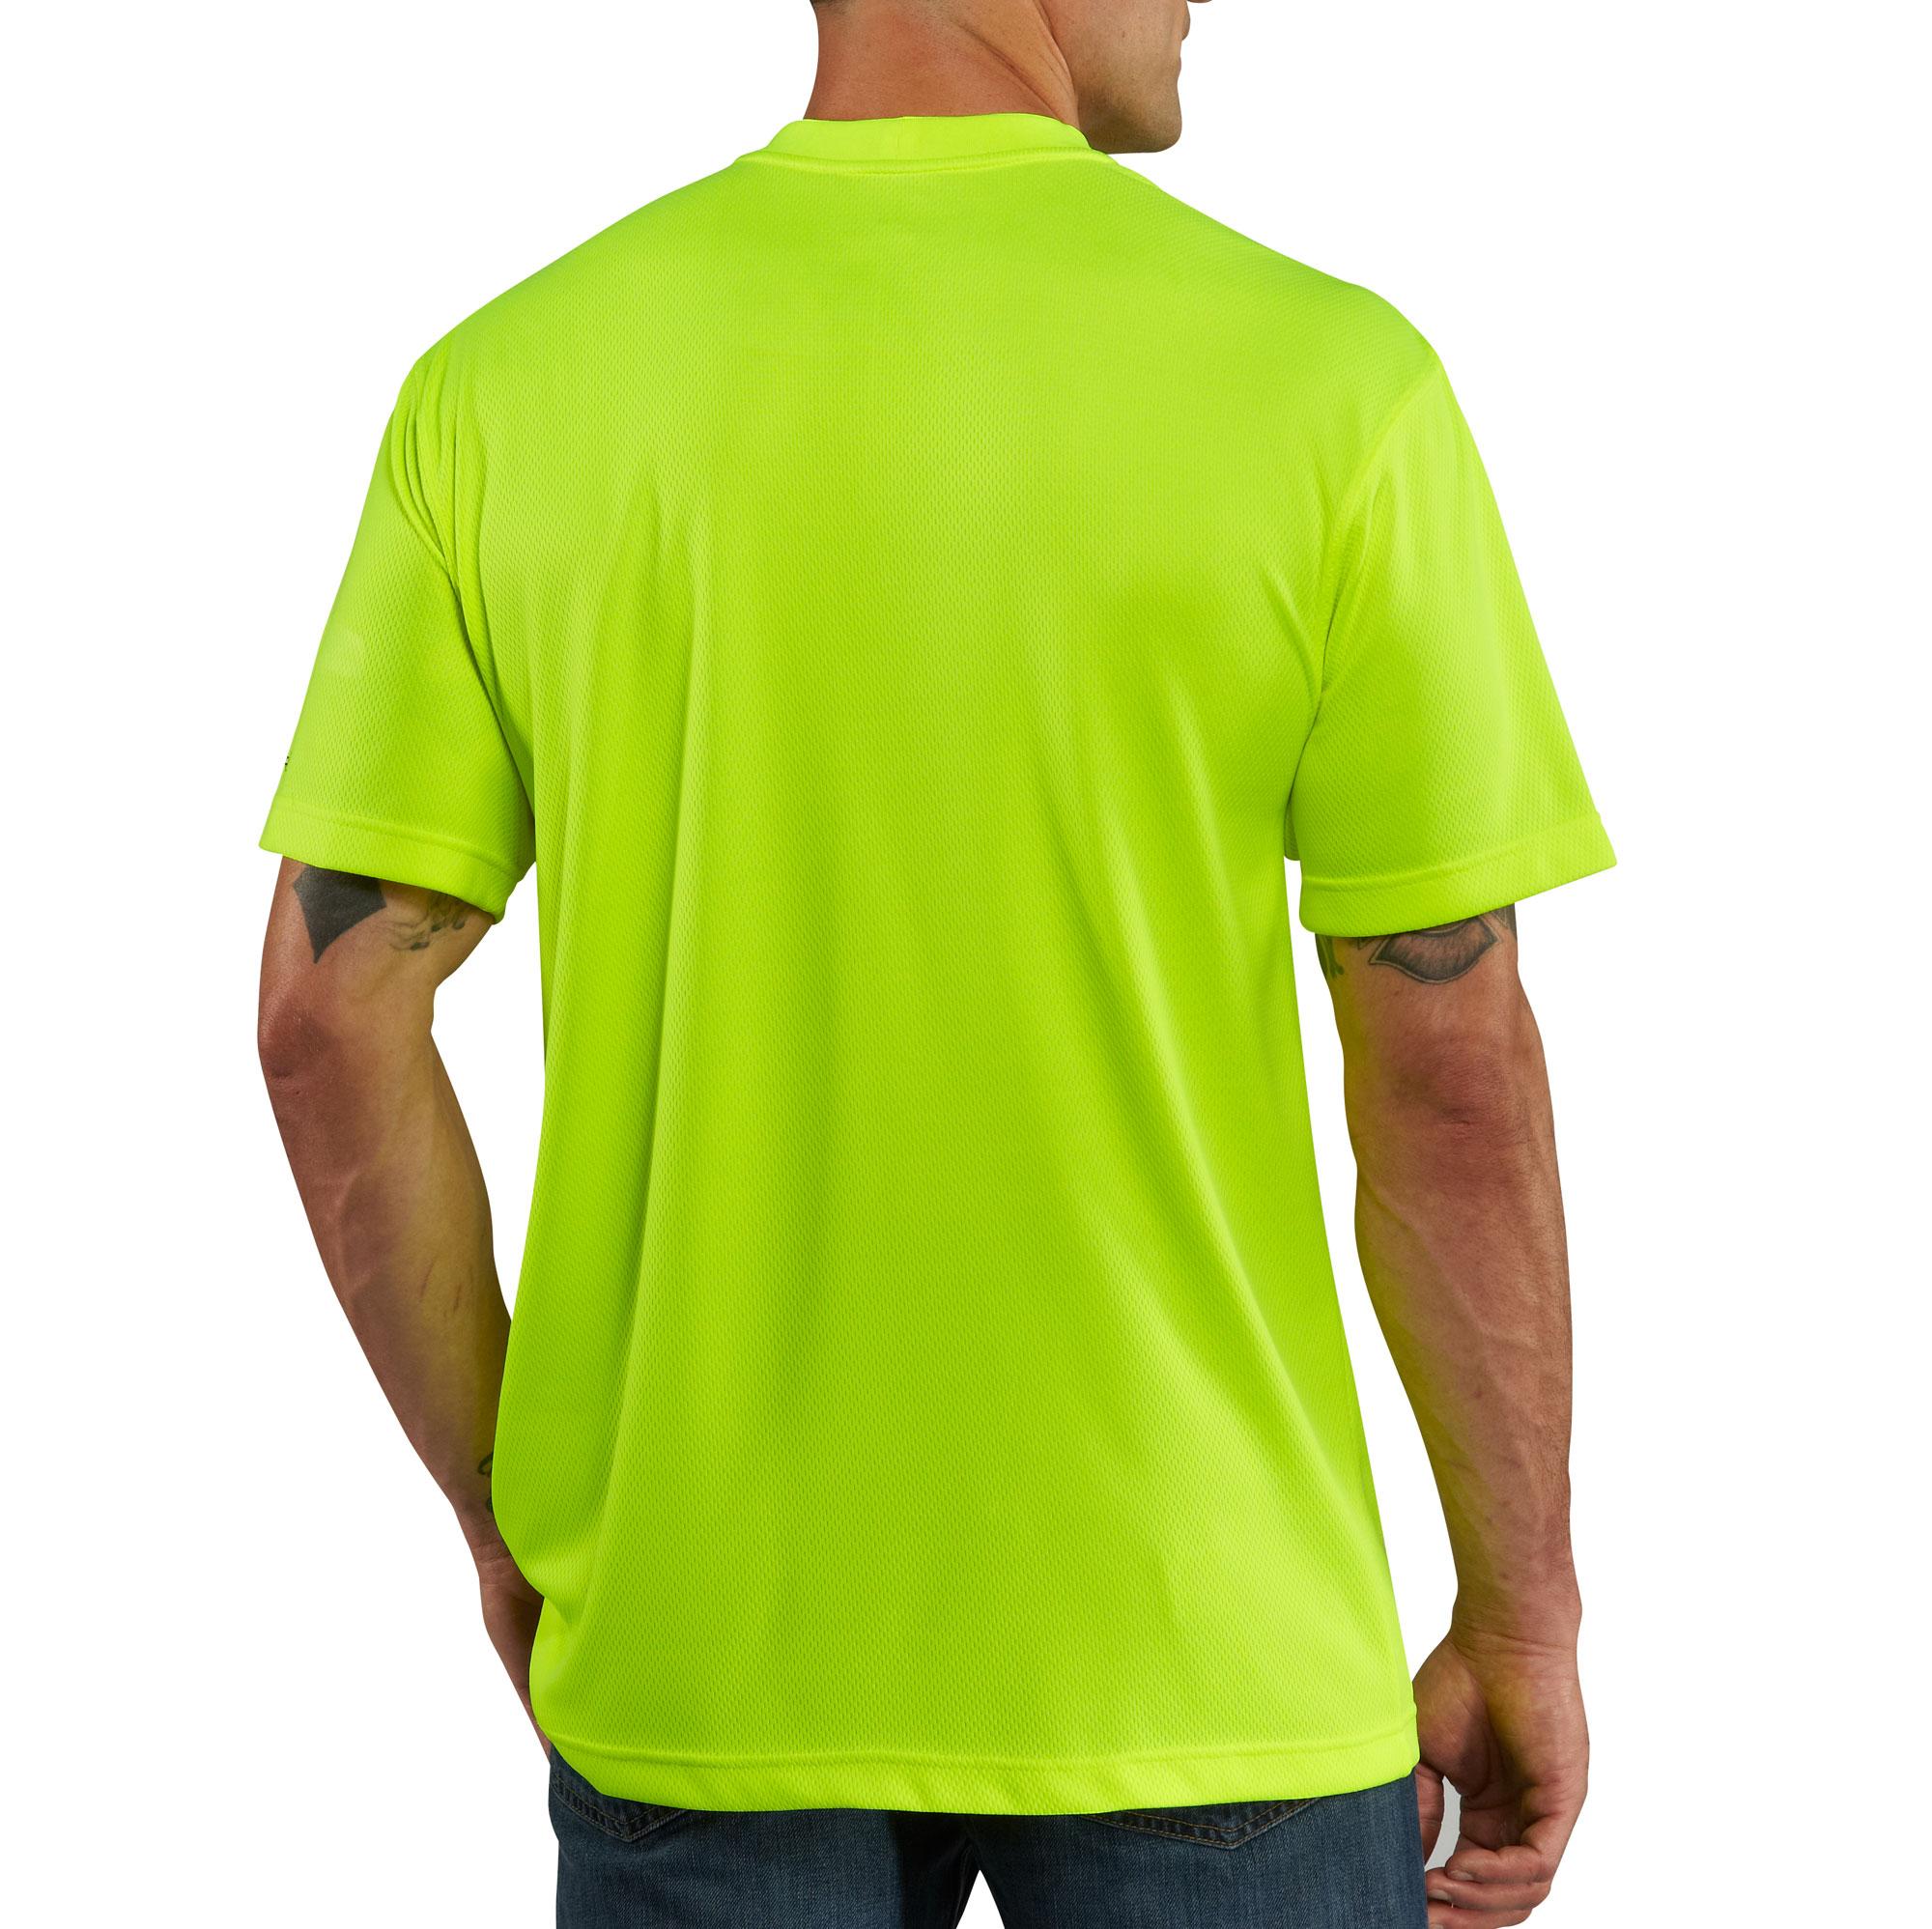 Carhartt Explorer Graphic Short Sleeve T-ShirtLimited Edition104183Rare